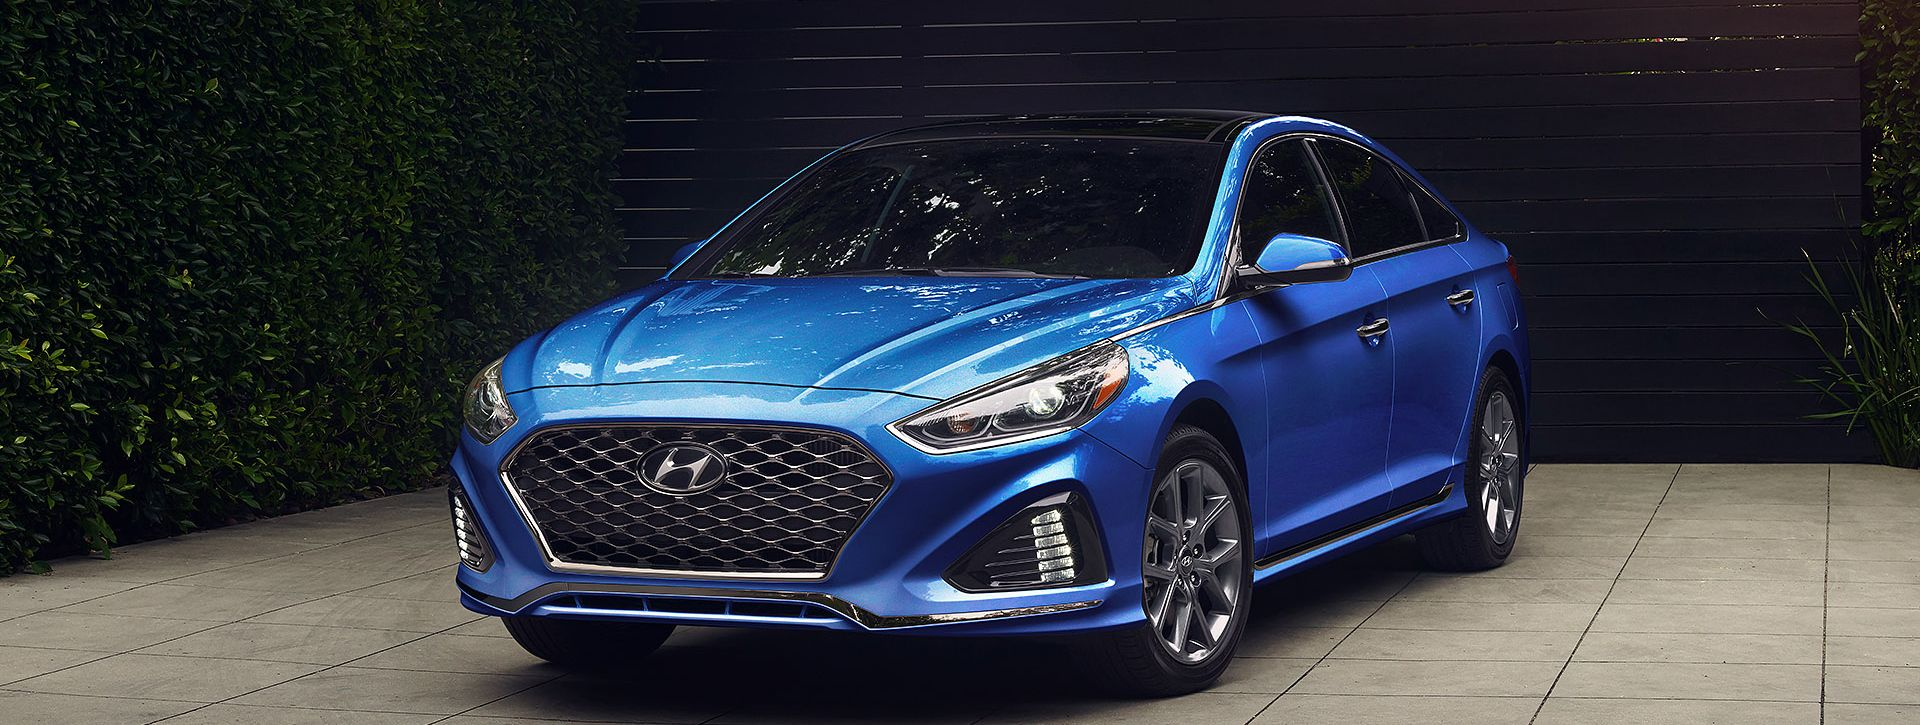 2019 Hyundai Sonata Leasing Near Springfield Va Pohanka